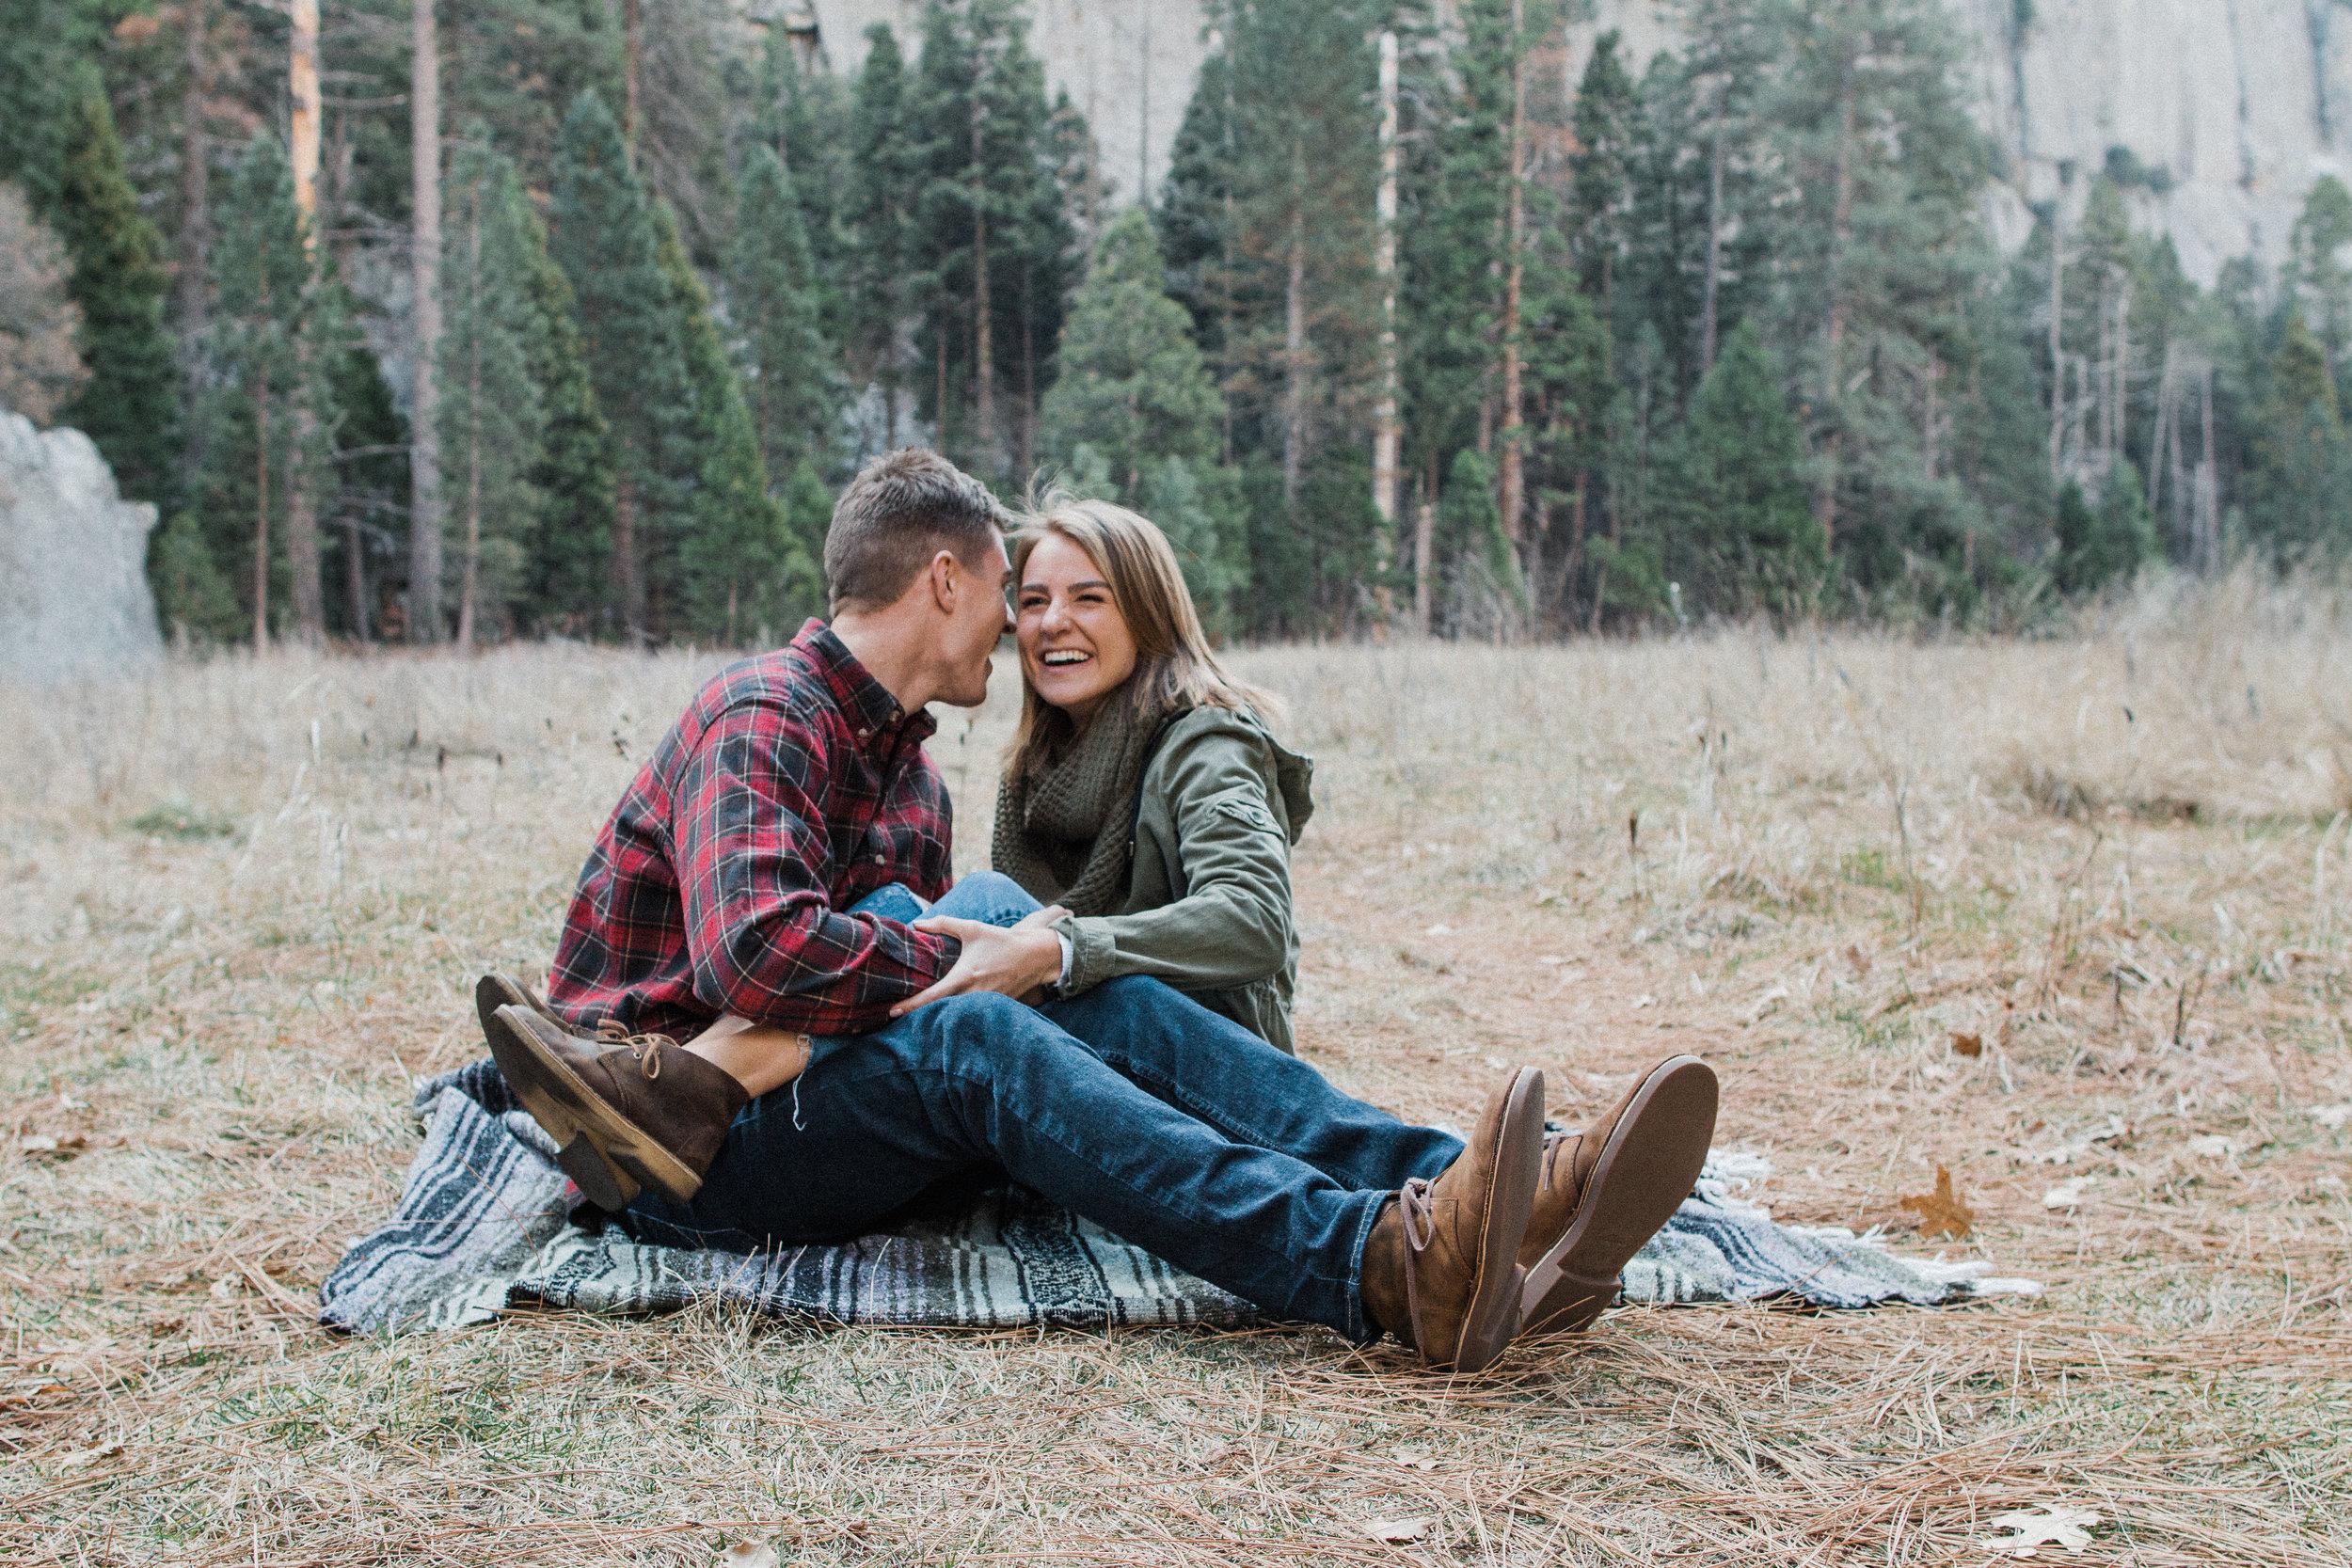 Yosemite-california-elopement-engagment-adventure-session-photographer